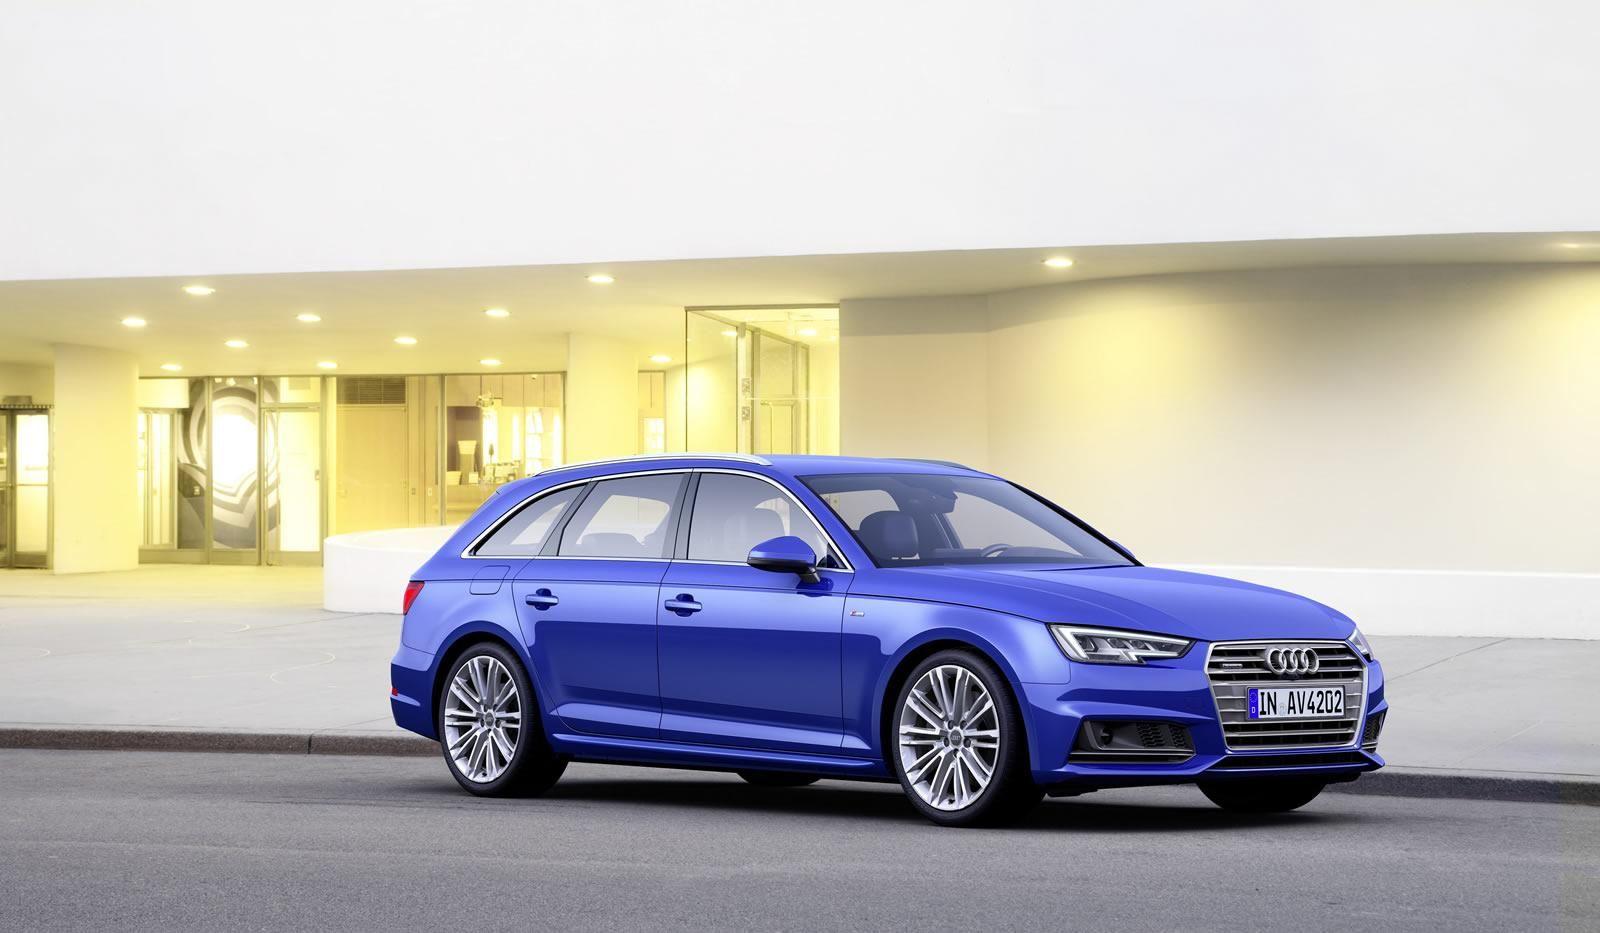 2016 Audi A4 Avant officially unveiled